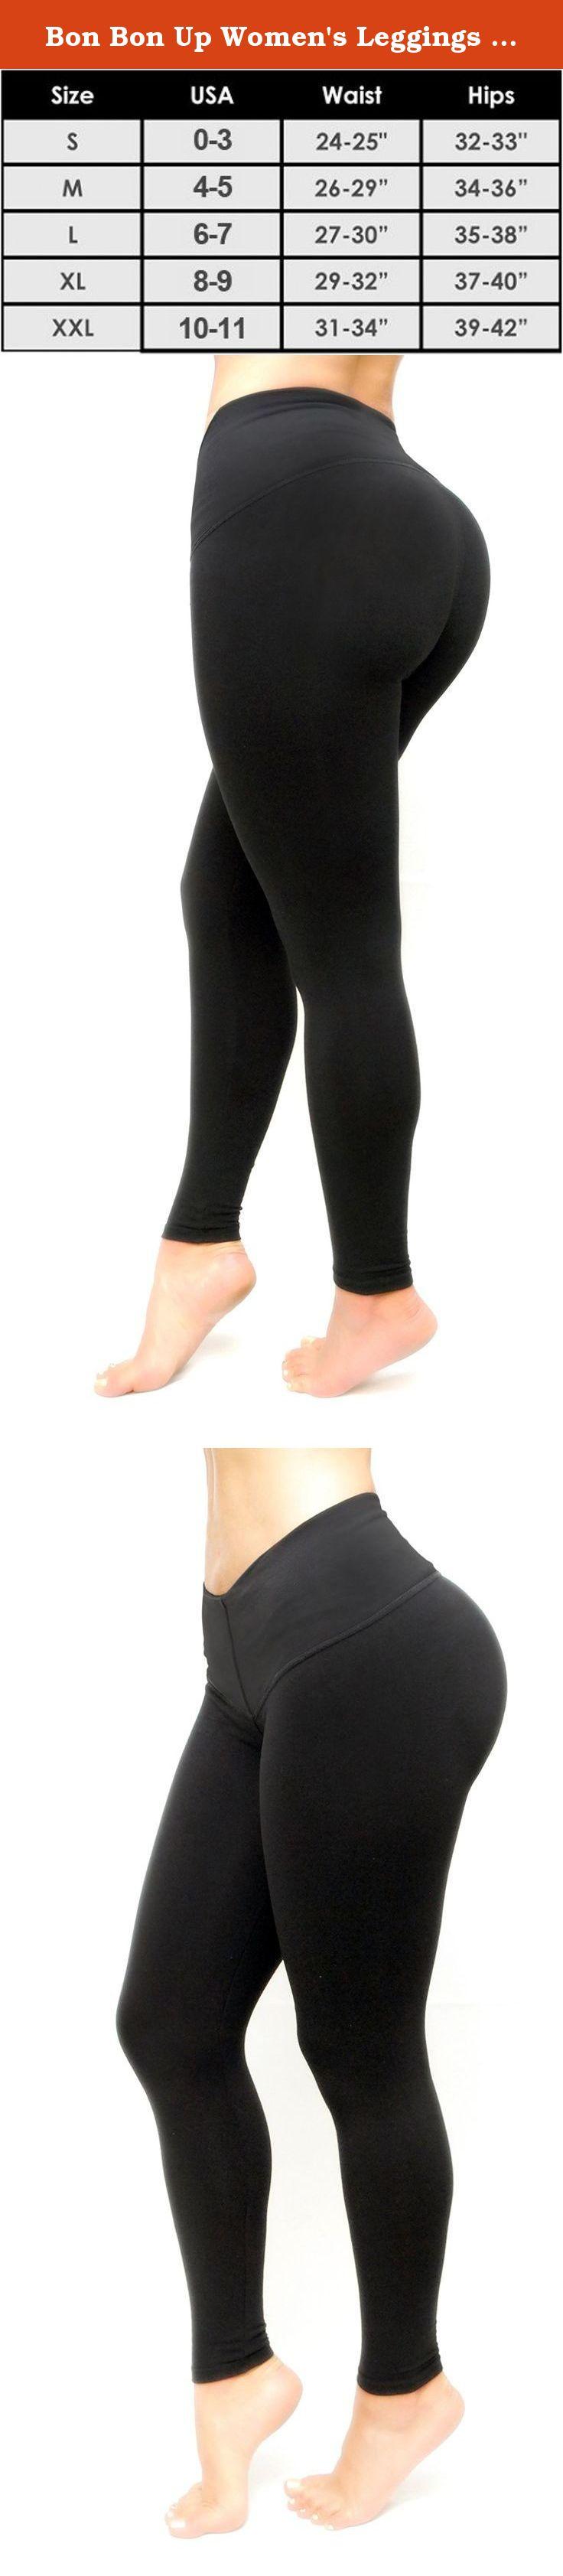 fb9af0bdf5479 Bon Bon Up Women s Leggings With Internal Body Shaper -Butt Lifter-S-Black